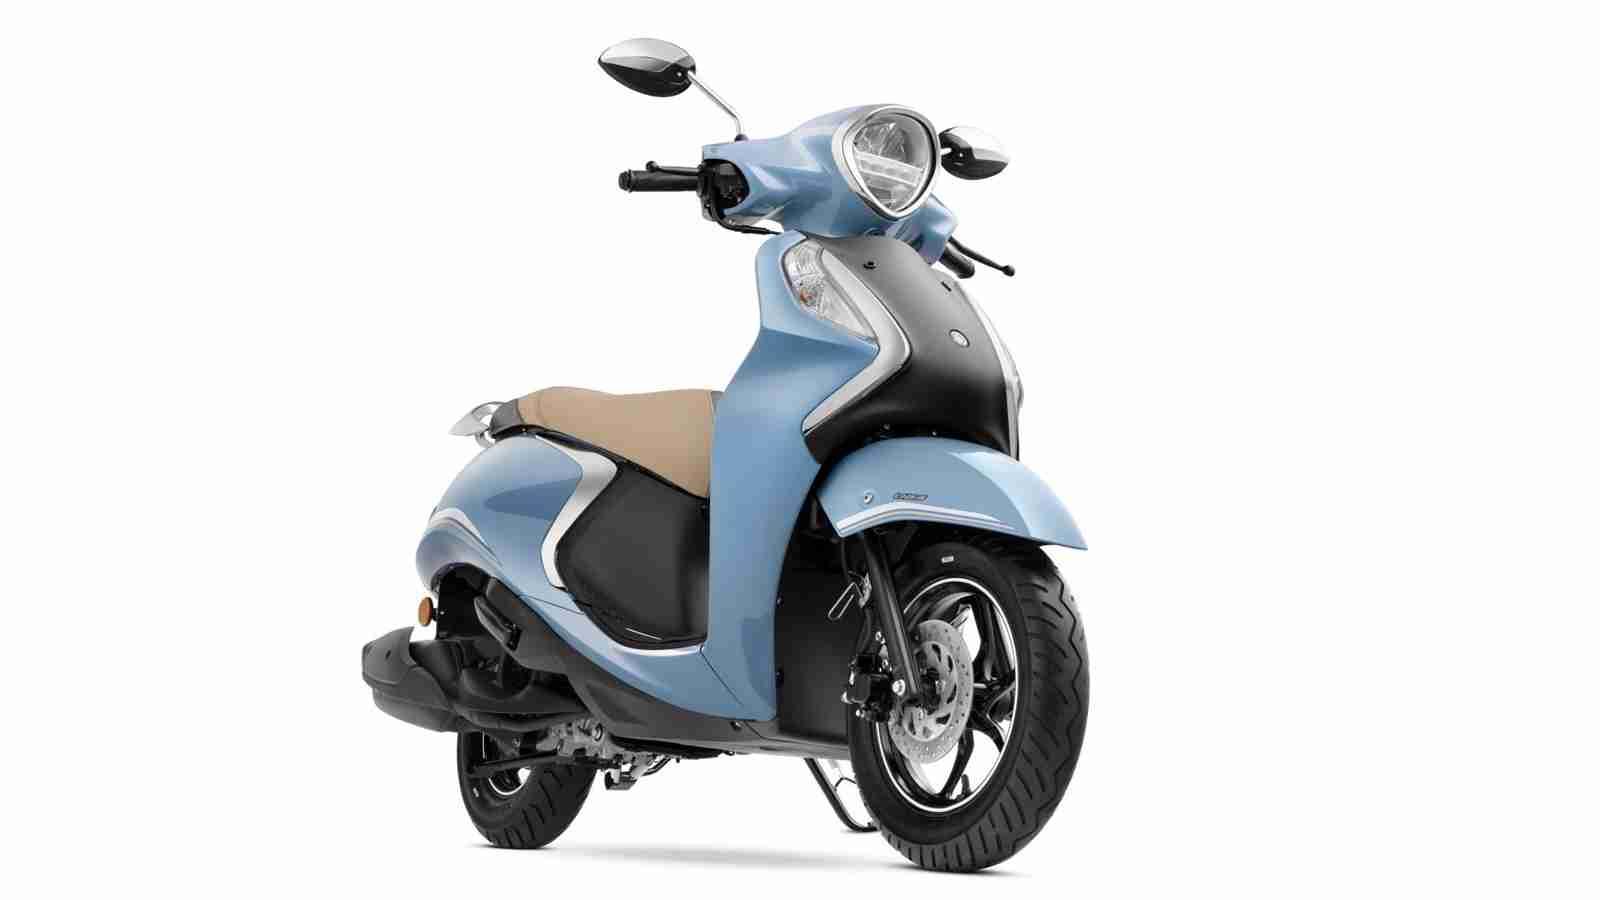 Yamaha Fascino 125 FI Hybrid Disc Variant - Cool Blue Metallic colour option